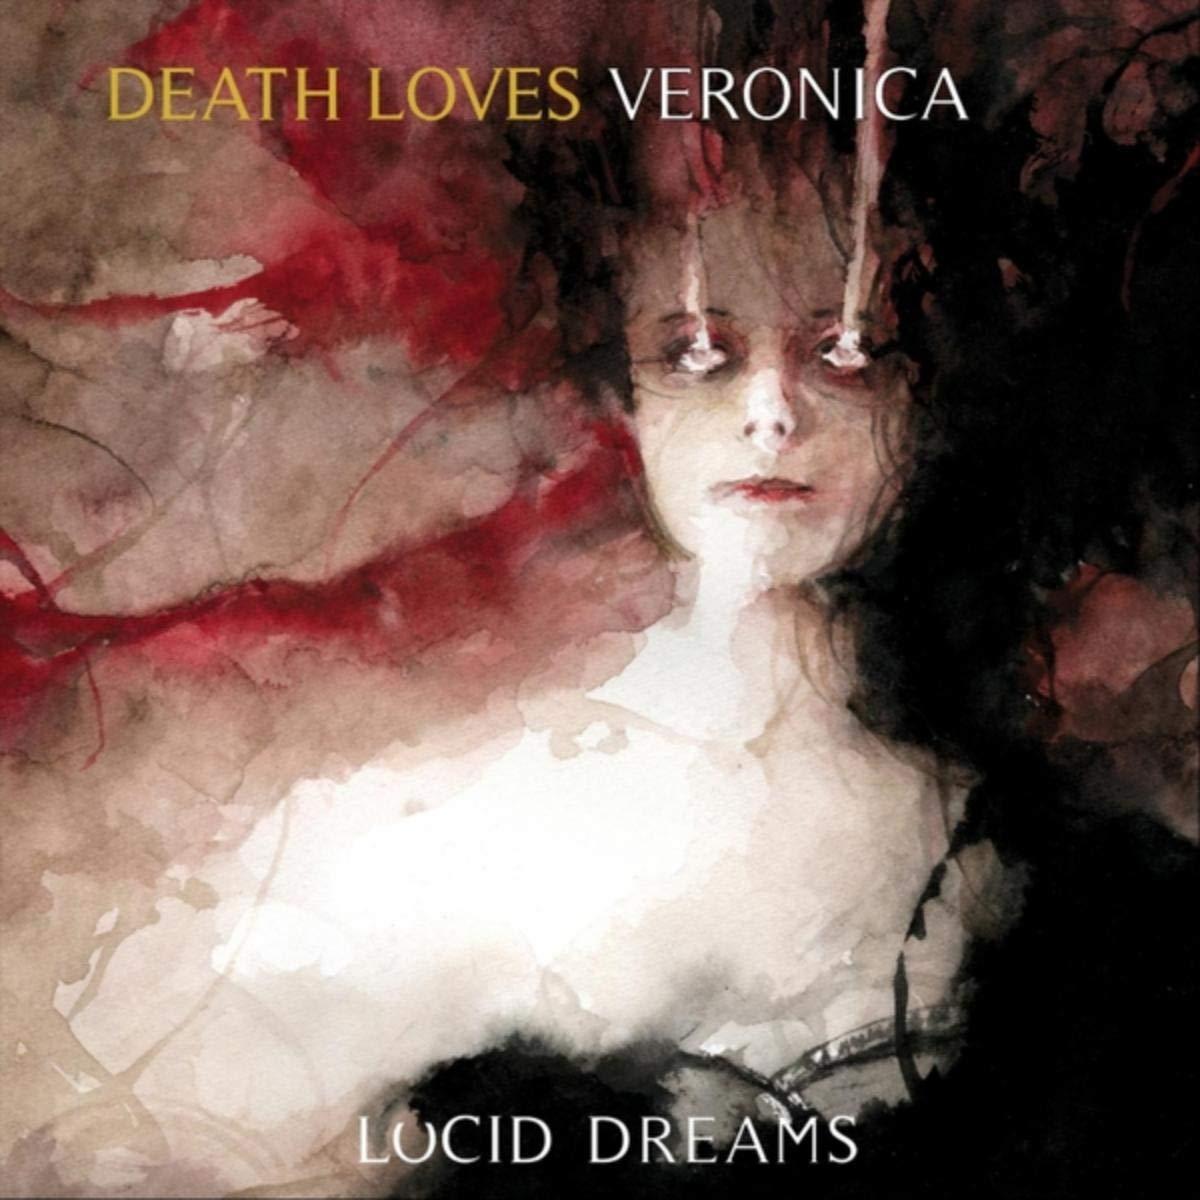 Death Loves Veronica – Lucid Dreams (2020) [FLAC]